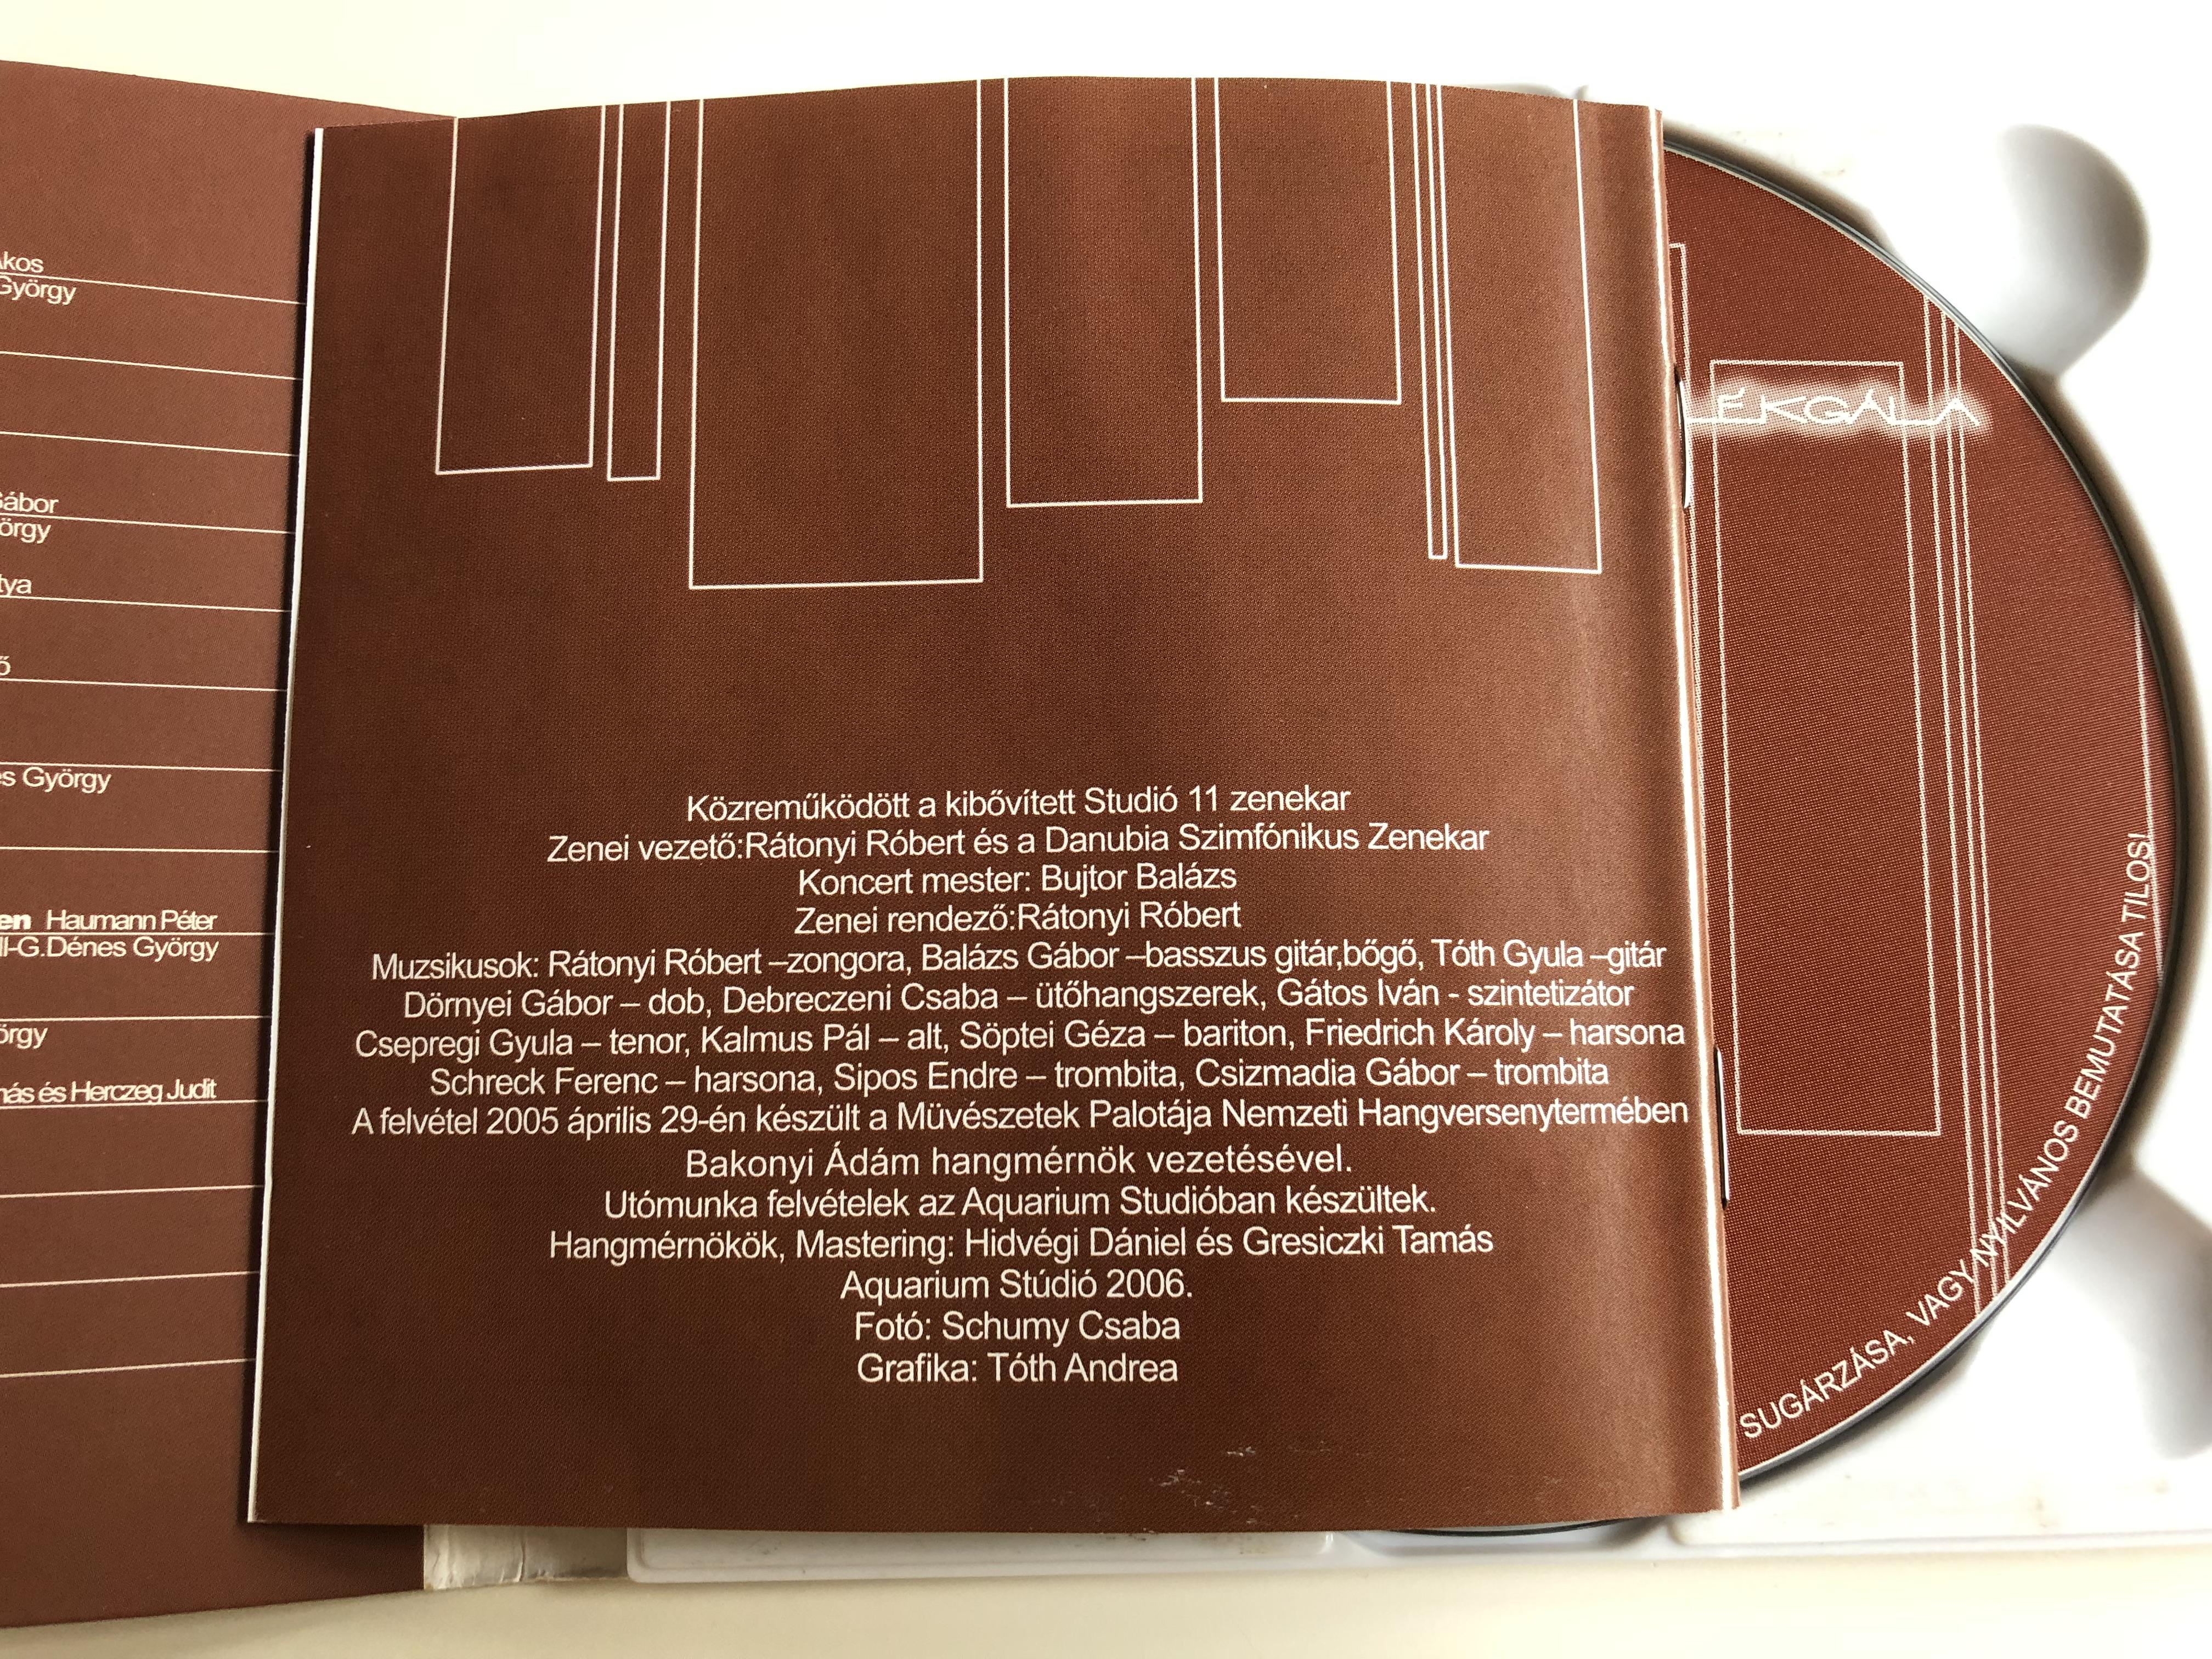 g.-d-nes-gy-rgy-eml-kg-la-zs-ti-danubia-symphony-orchestra-r-tonyi-r-bert-concert-master-bujtor-bal-zs-magneoton-audio-cd-2006-9-.jpg